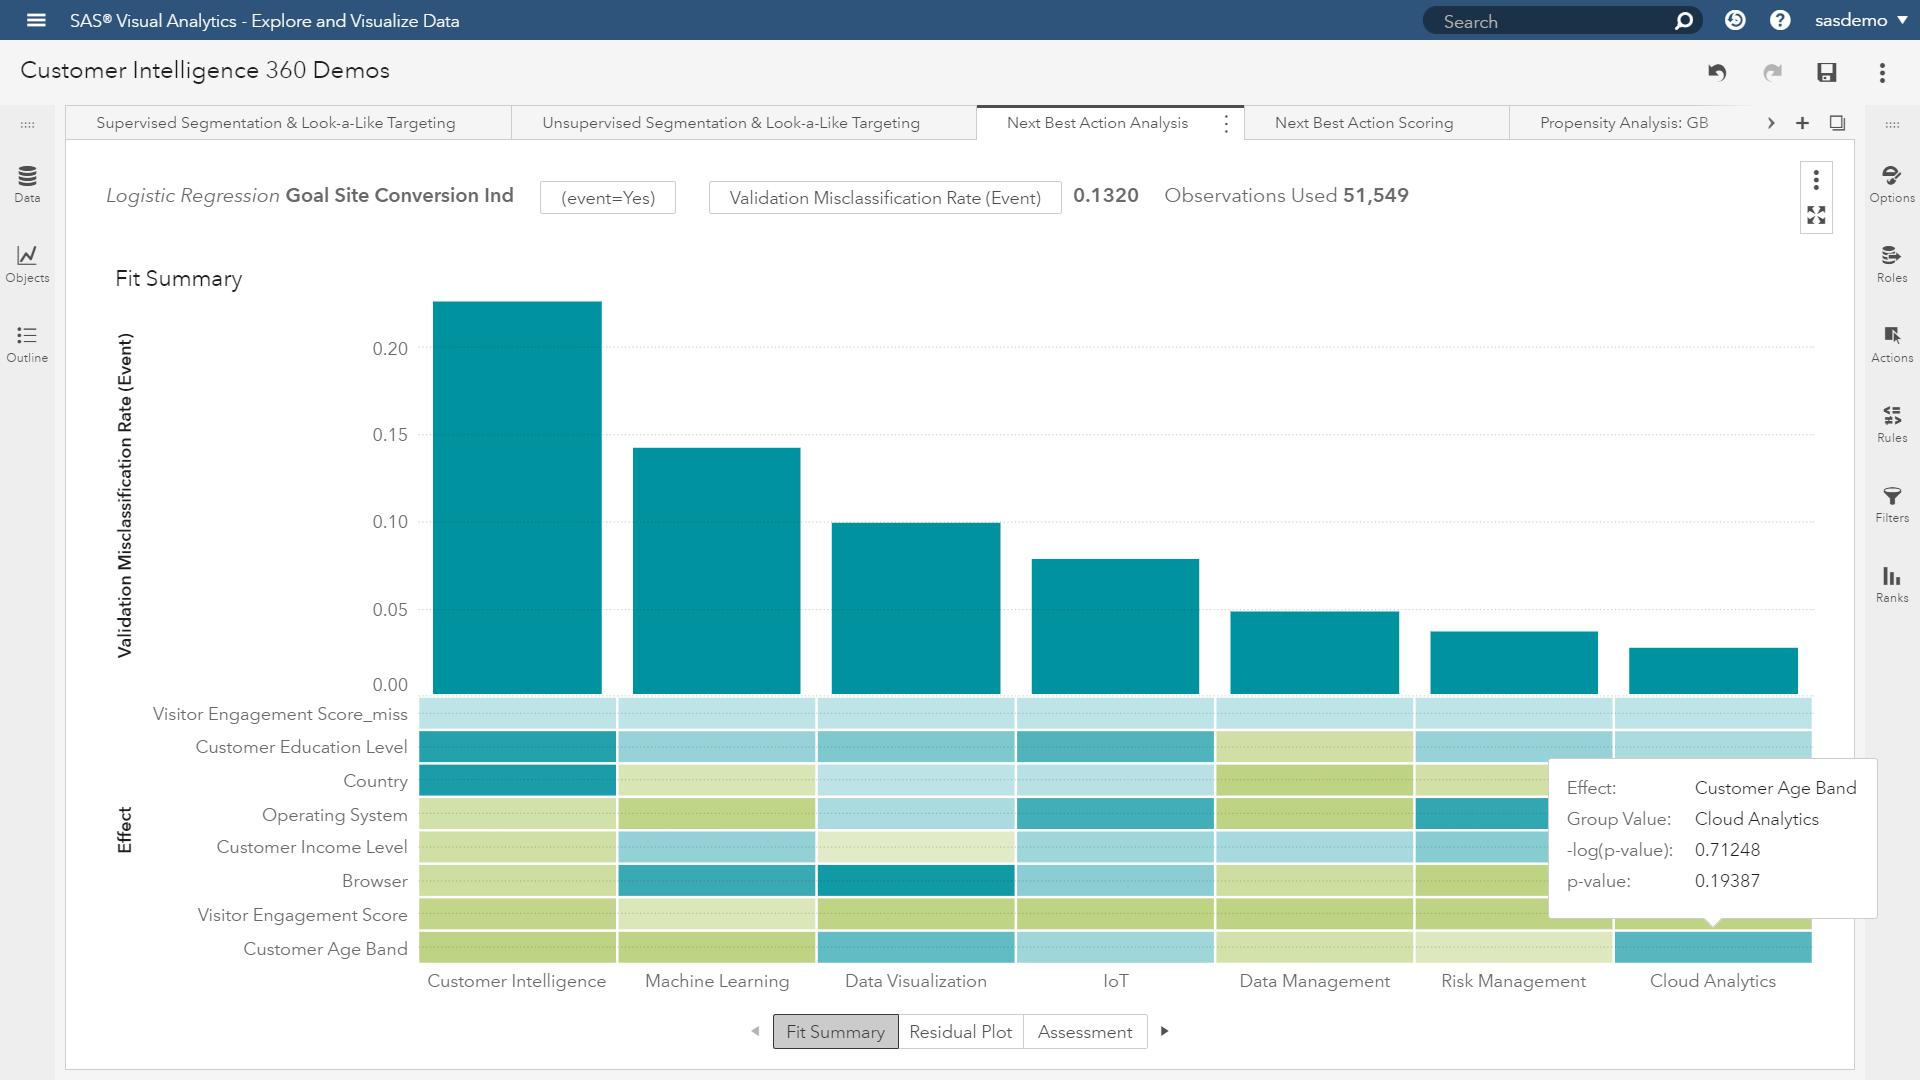 sas customer intelligence 360 predictive next best actions